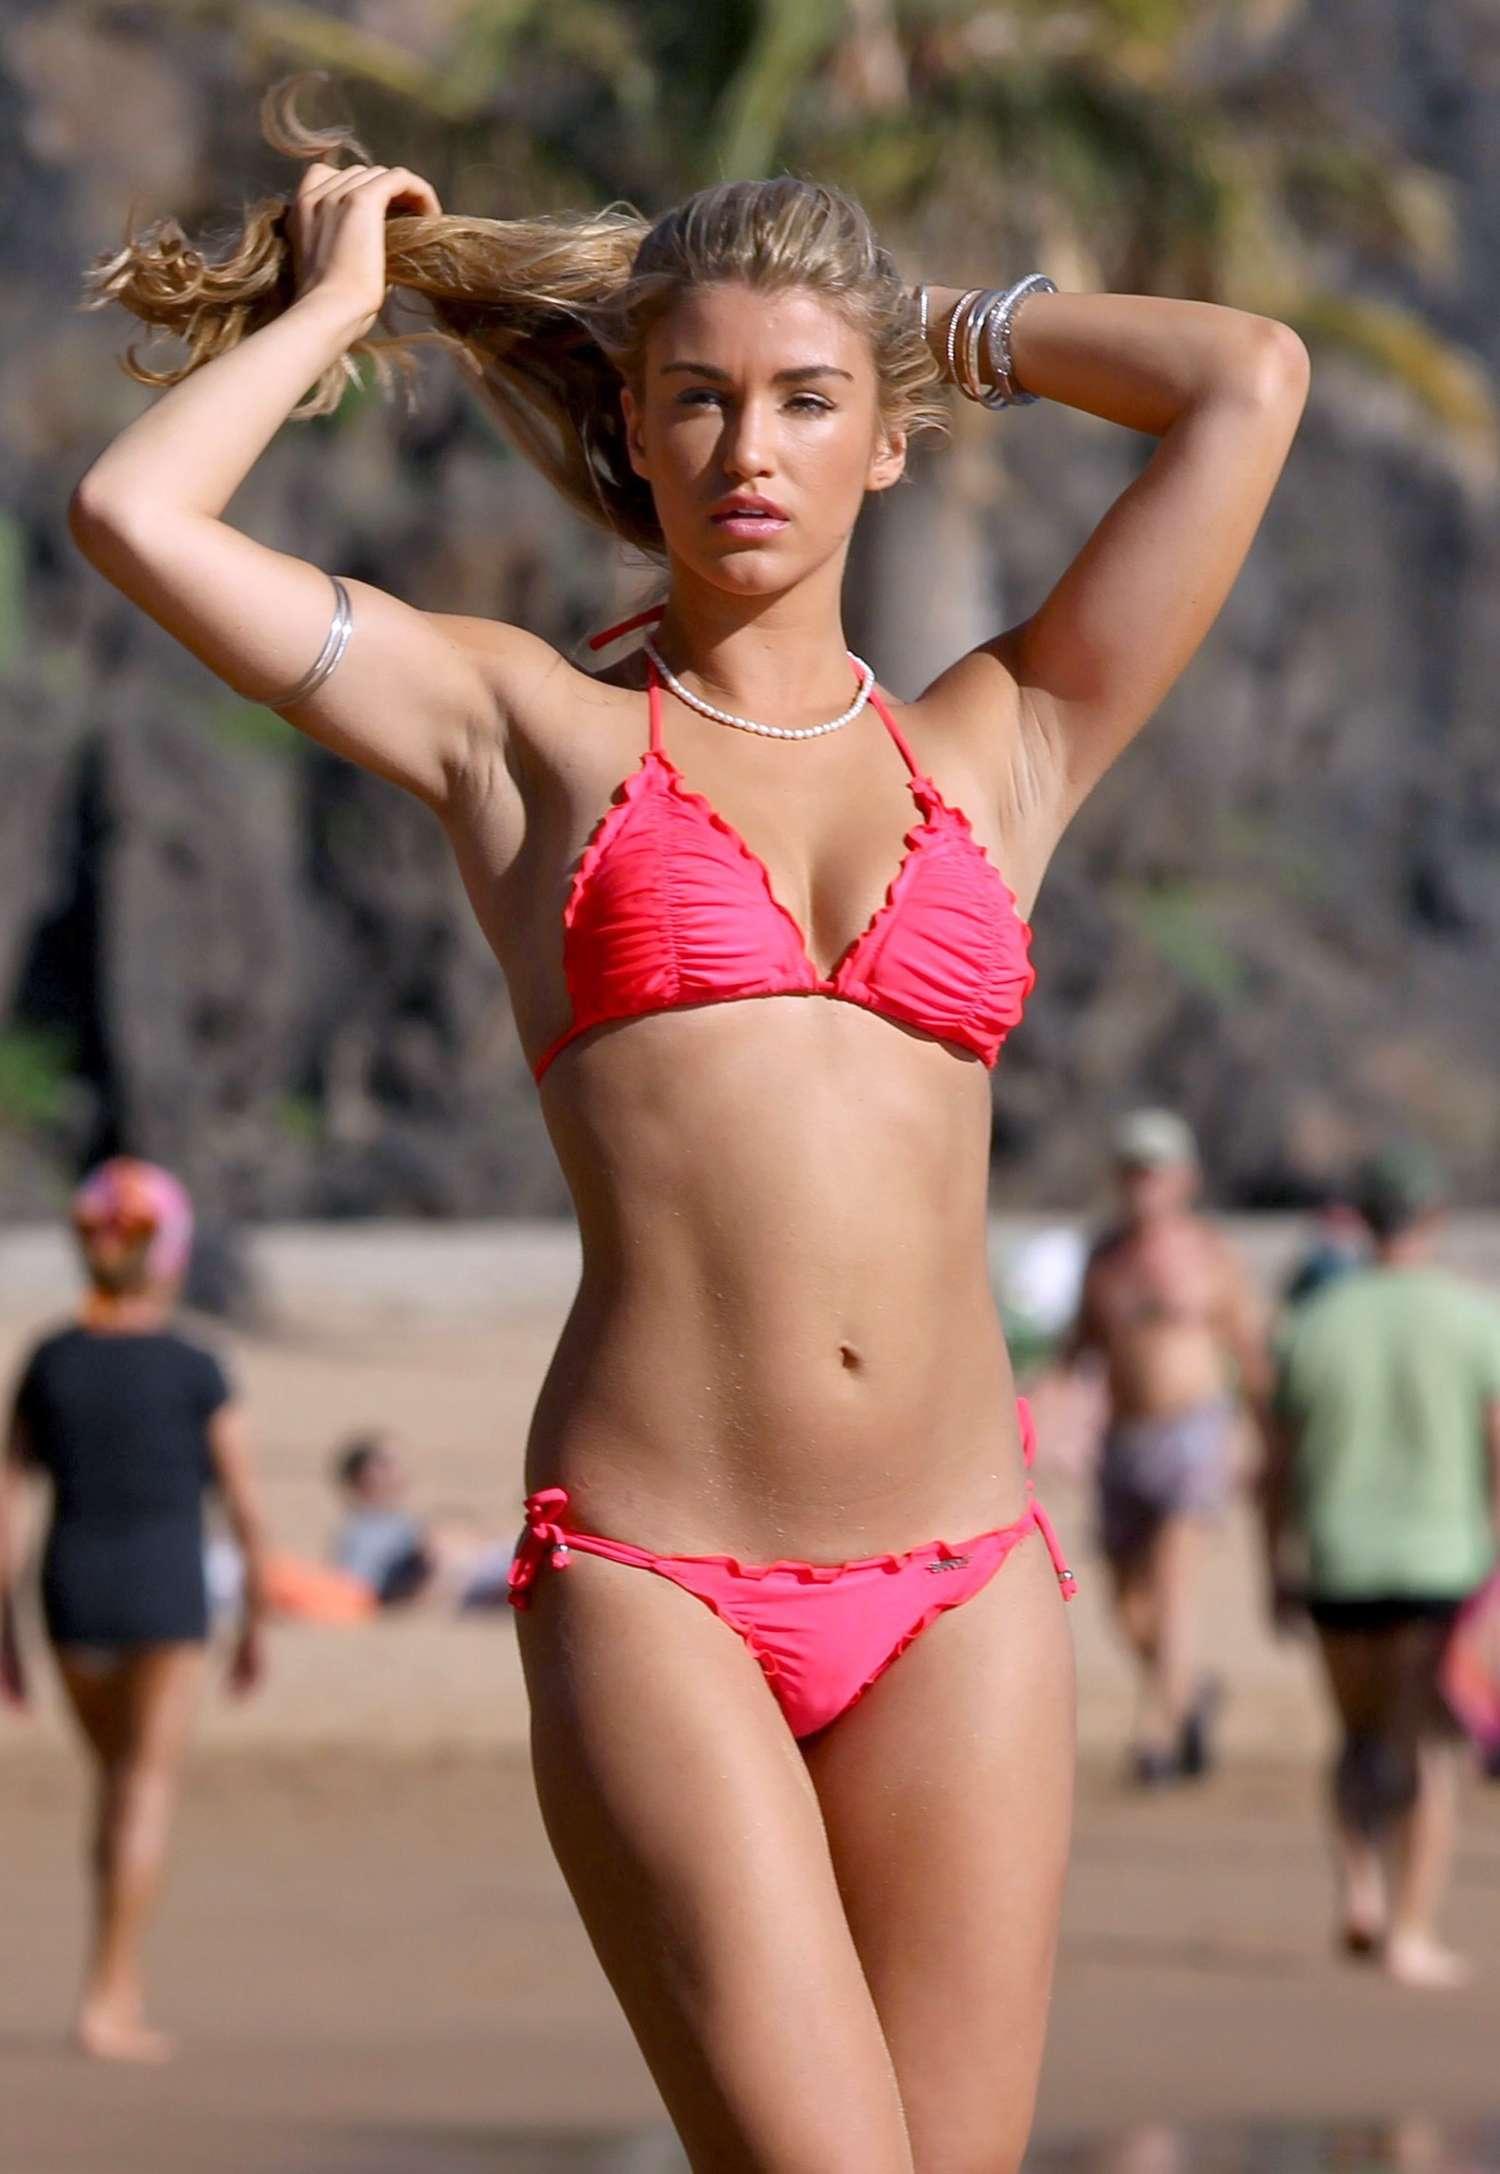 Amy Willerton 2014 : Amy Willerton Bikini Photos: 2014 in Spain -07